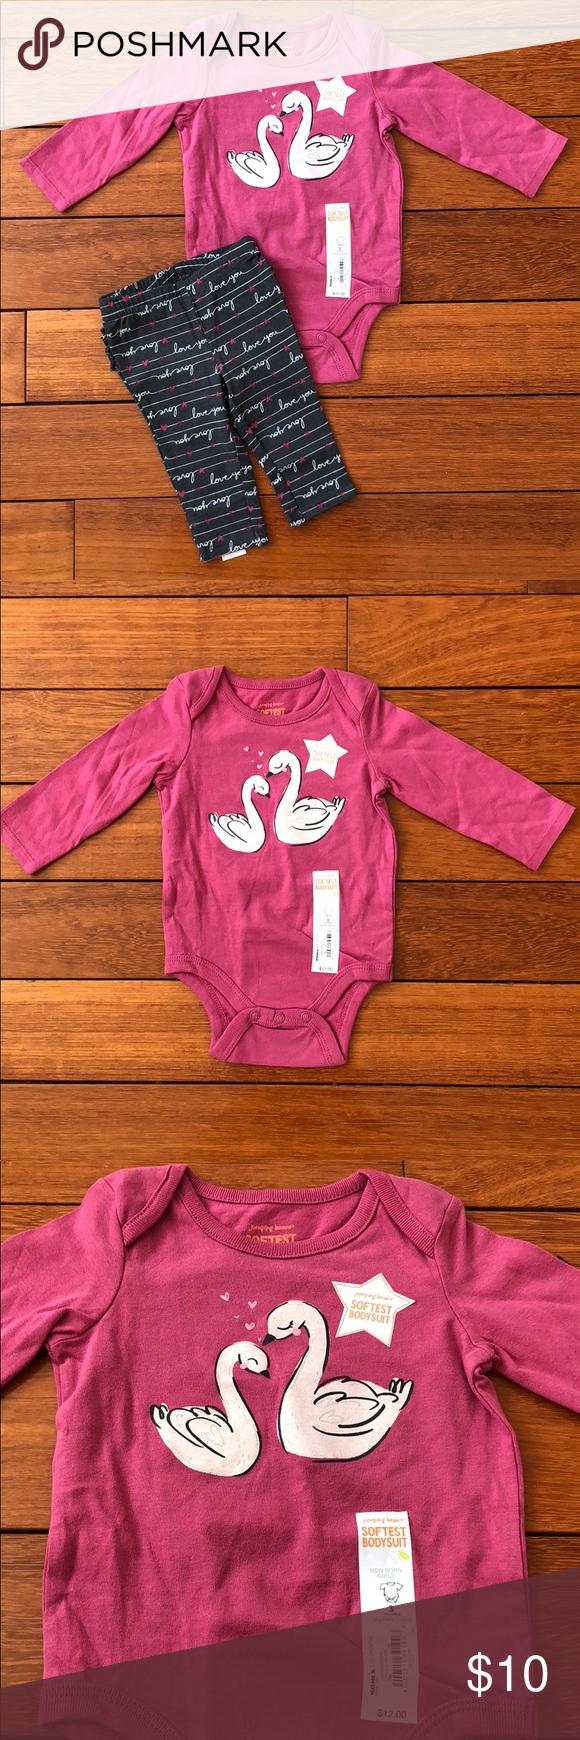 Girl/'s Easter Bunny Pink Snap Shirt NEW NWT $12 Newborn 3 months bodysuit